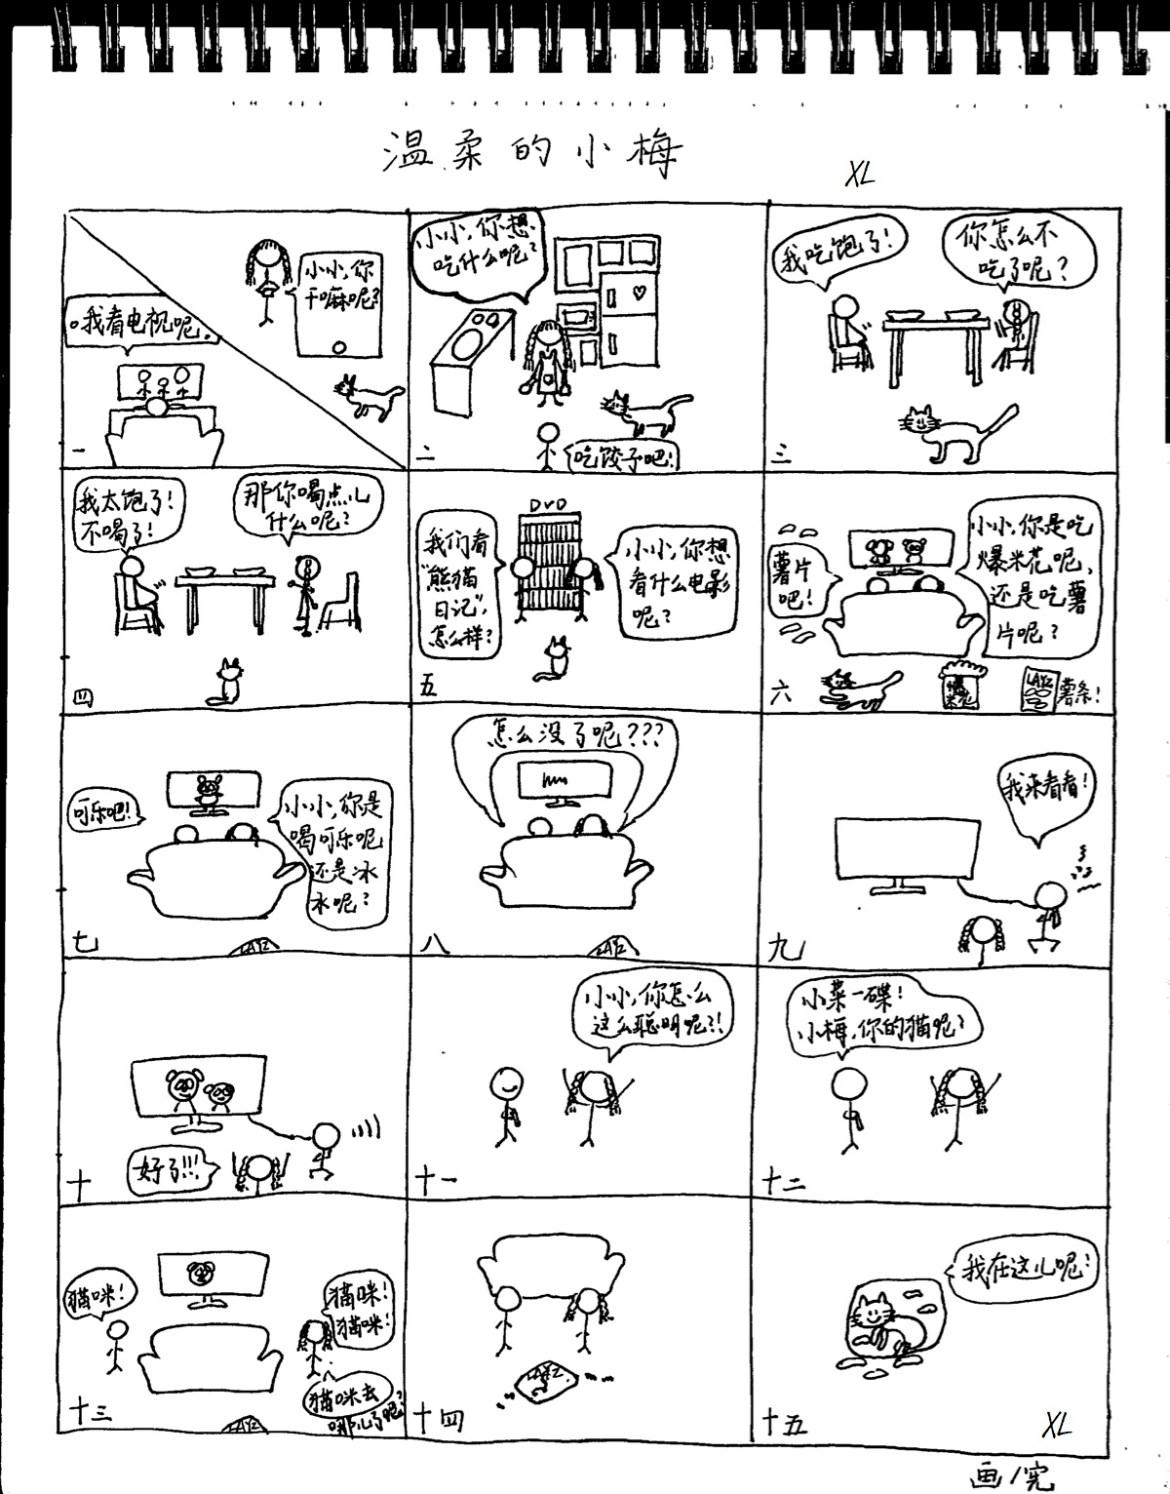 xian_lu_comic_strip_for_cfl_samples4